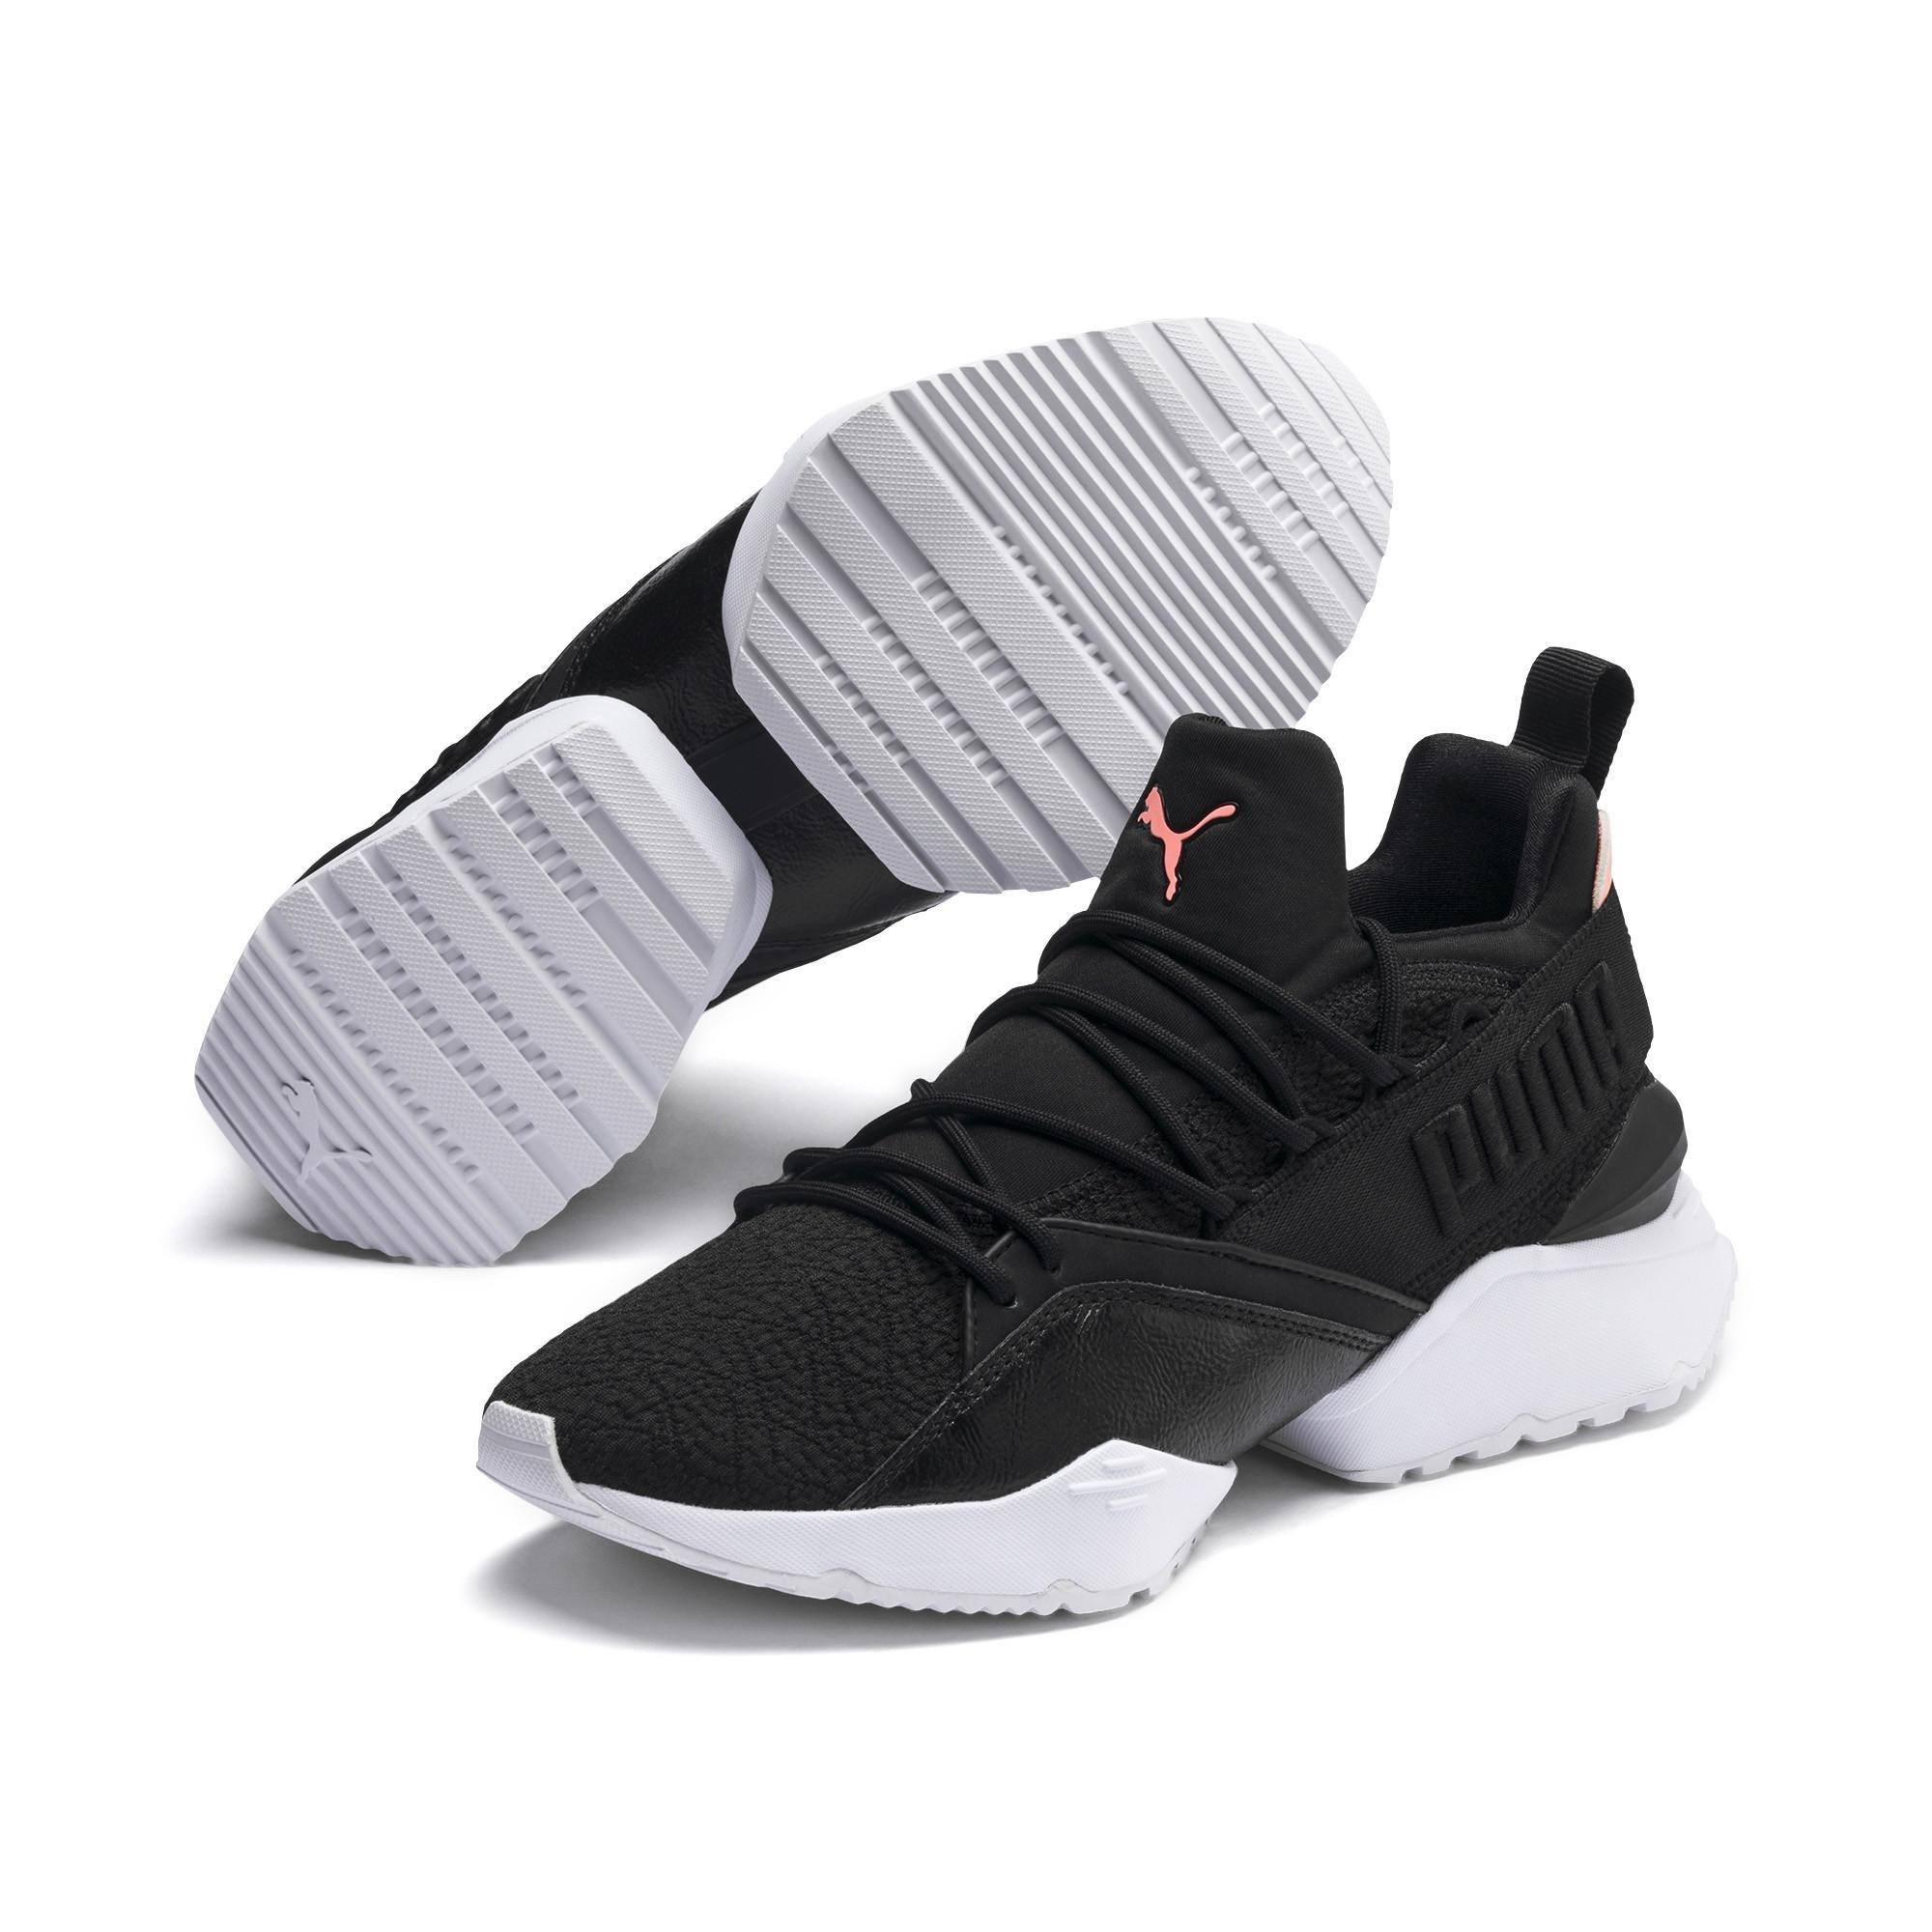 b788d5a492f PUMA - Black Muse Maia Bio Hacking Women s Sneakers - Lyst. View fullscreen